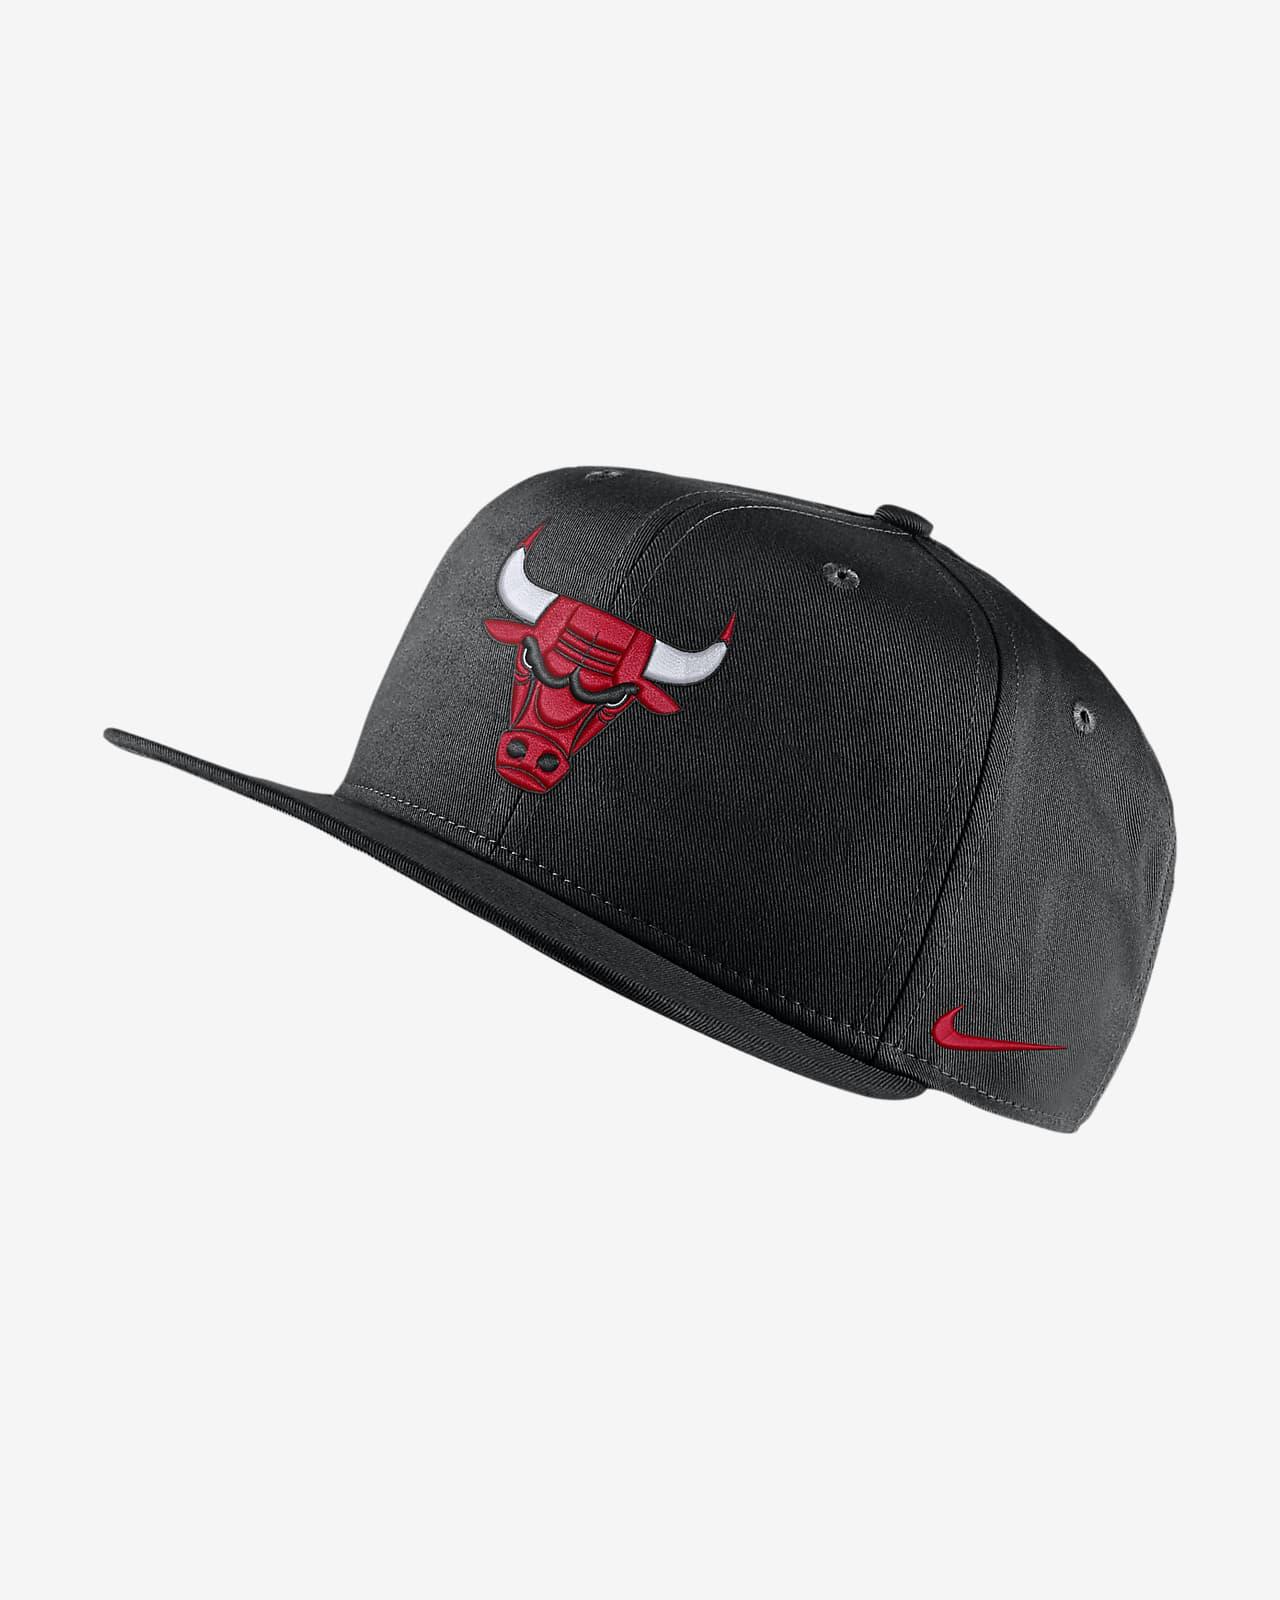 Casquette NBA Chicago Bulls Nike Pro